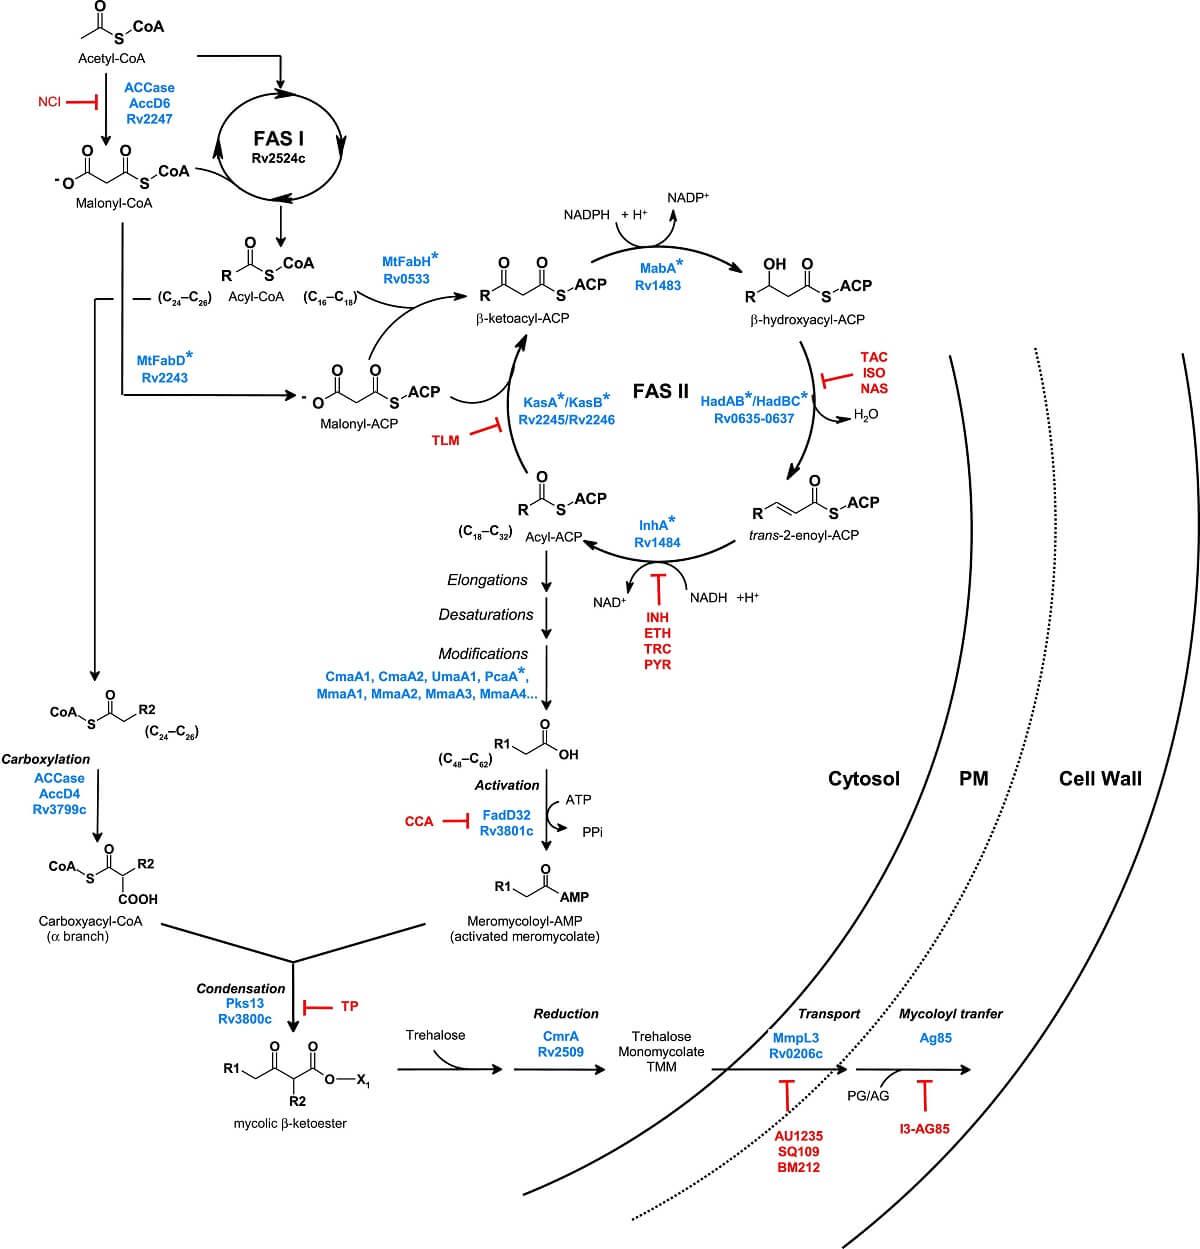 Mycolic acid biosynthesis